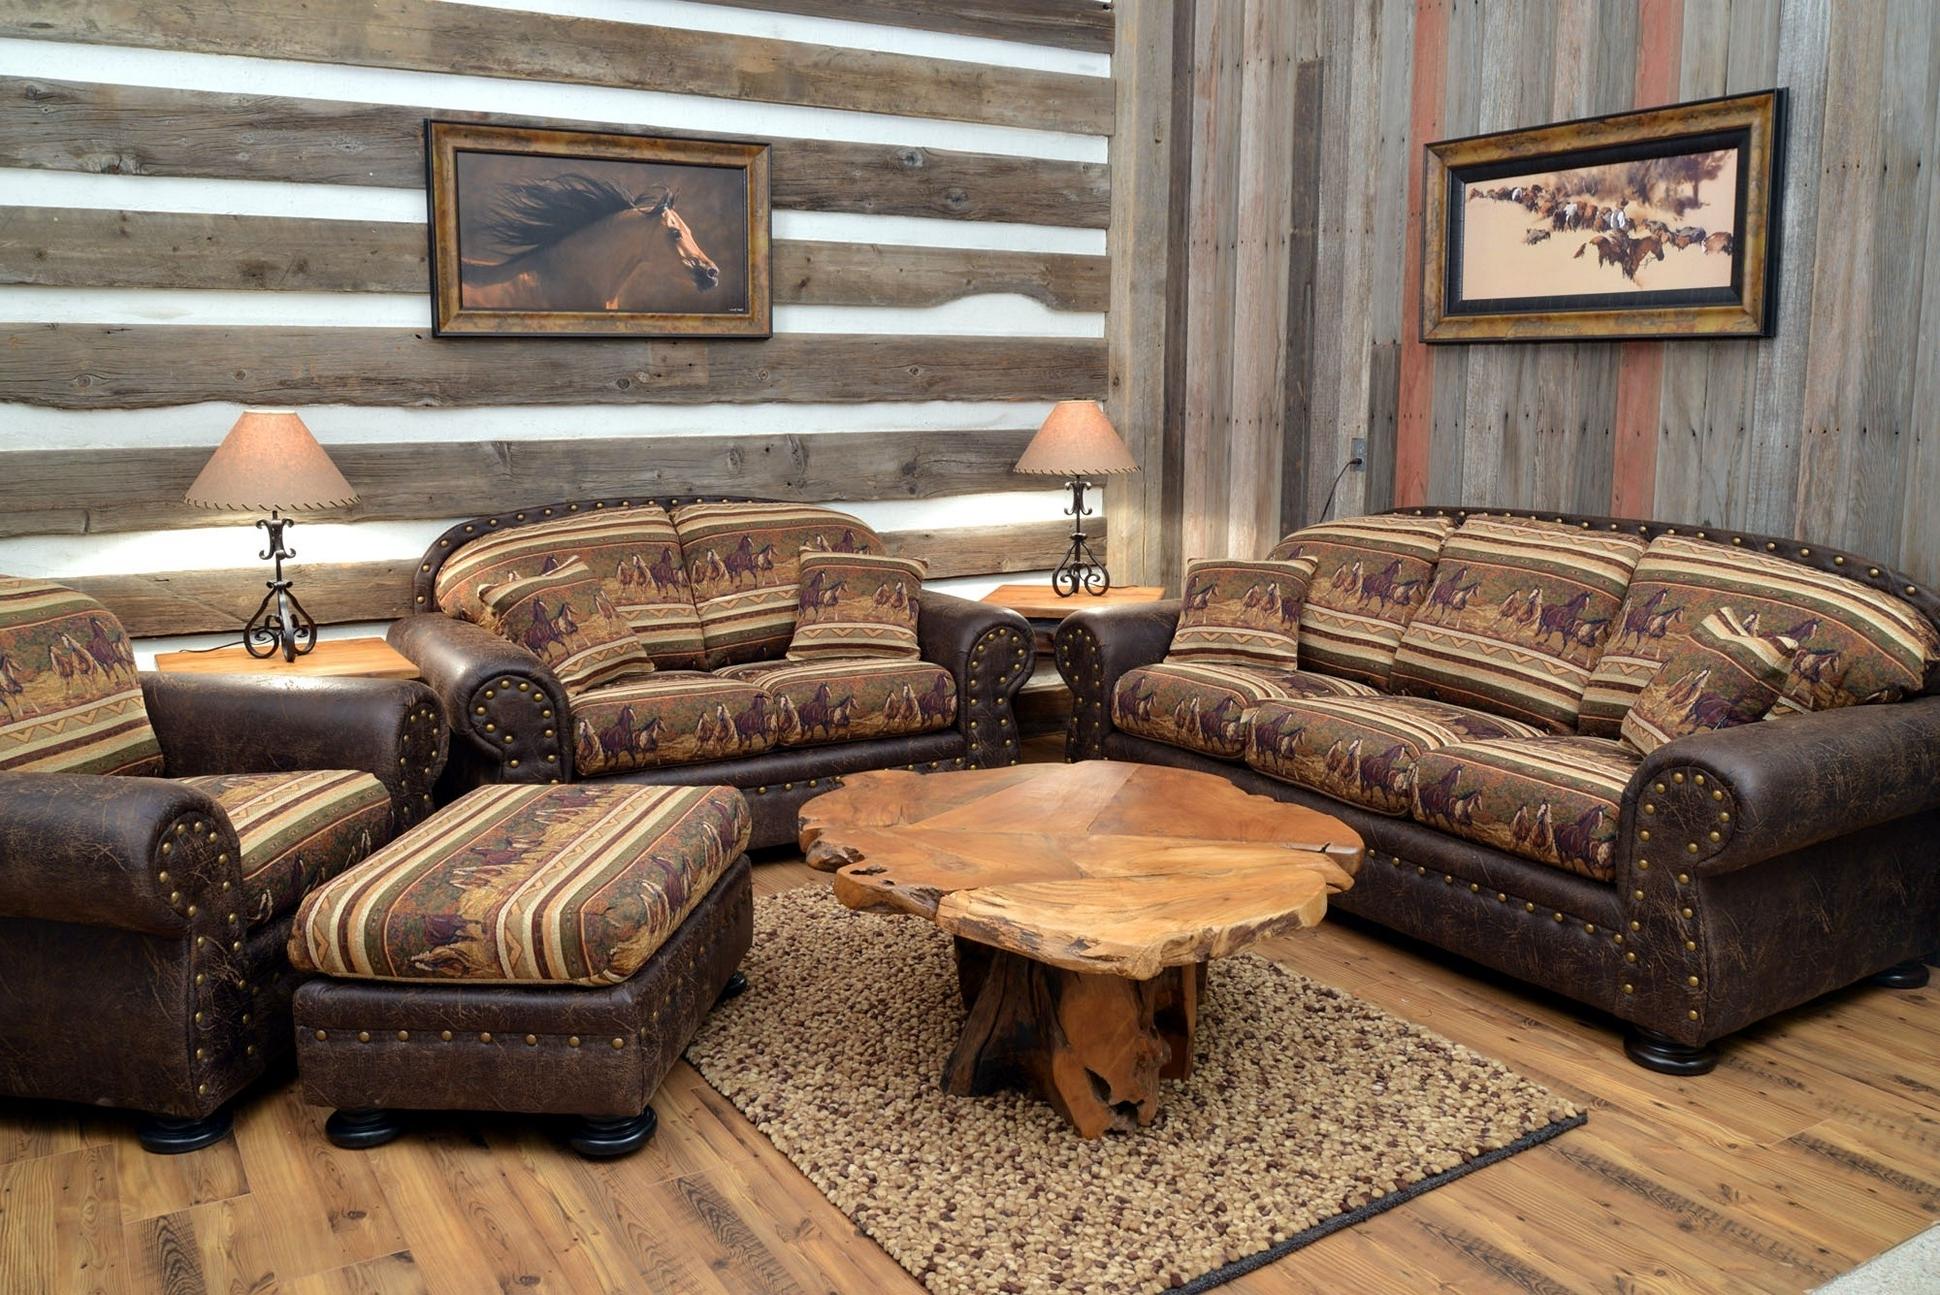 Most Popular Living Room Design : Italian Style Home Decor Ideas Luigi Cavalli For Italian Wall Art For Living Room (View 11 of 15)